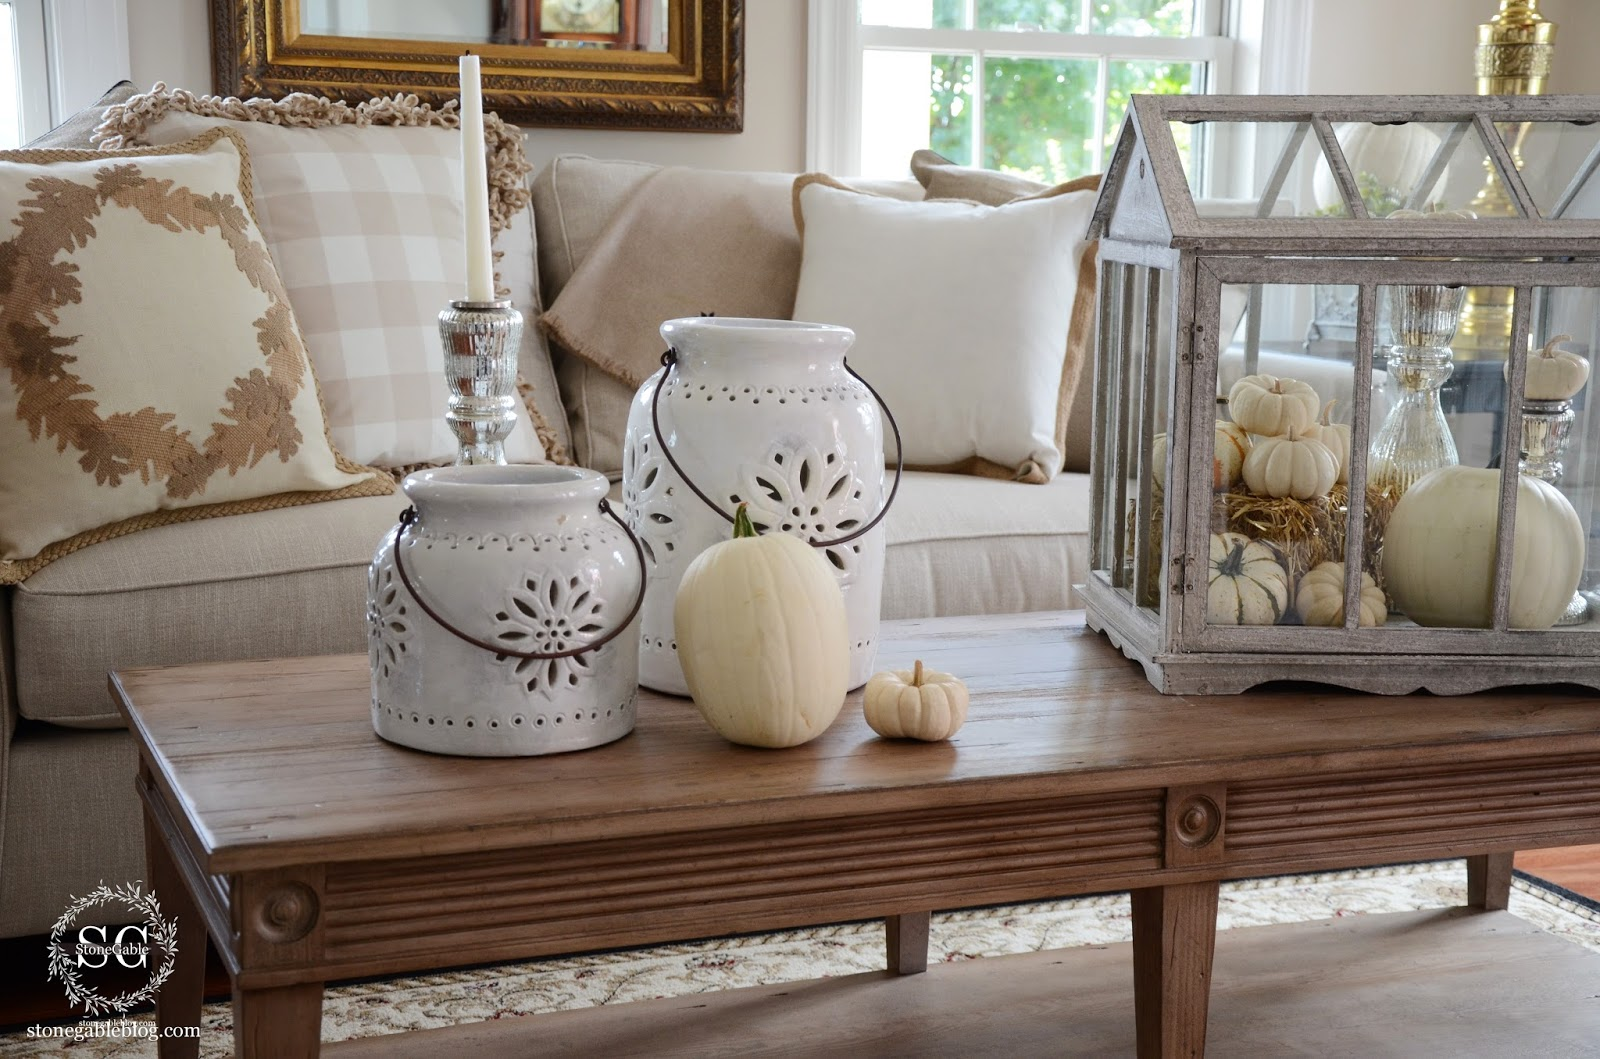 Decorating Blogs Southern Southern Home Design Blogs Coastal Living Home Decor Ideas